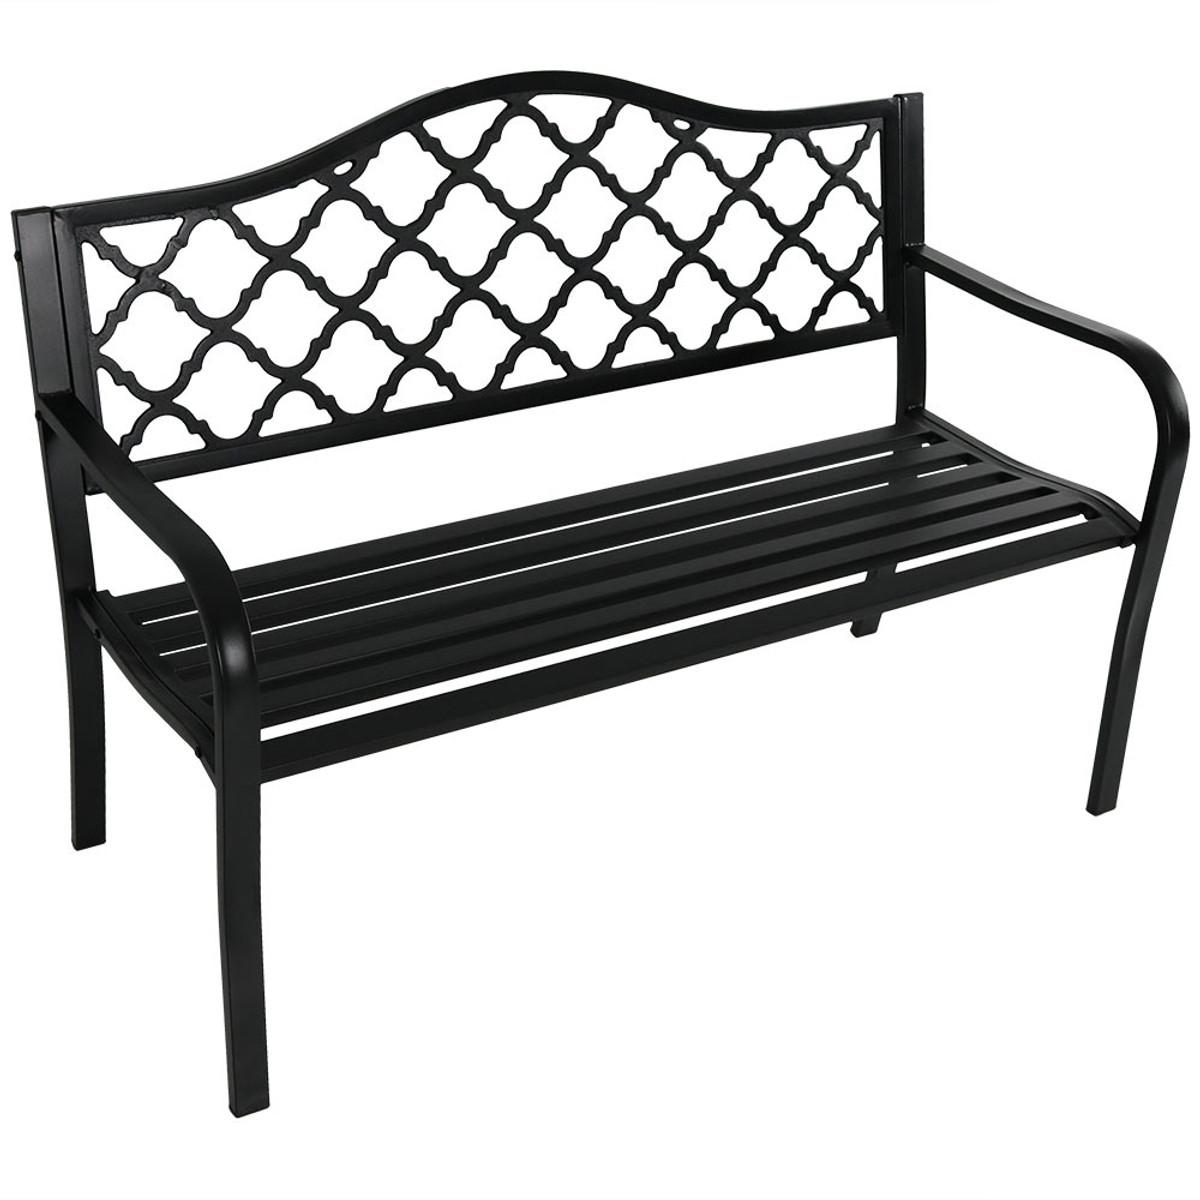 Picture of: Sunnydaze 50 Inch Outdoor Black Cast Iron Lattice Patio Bench